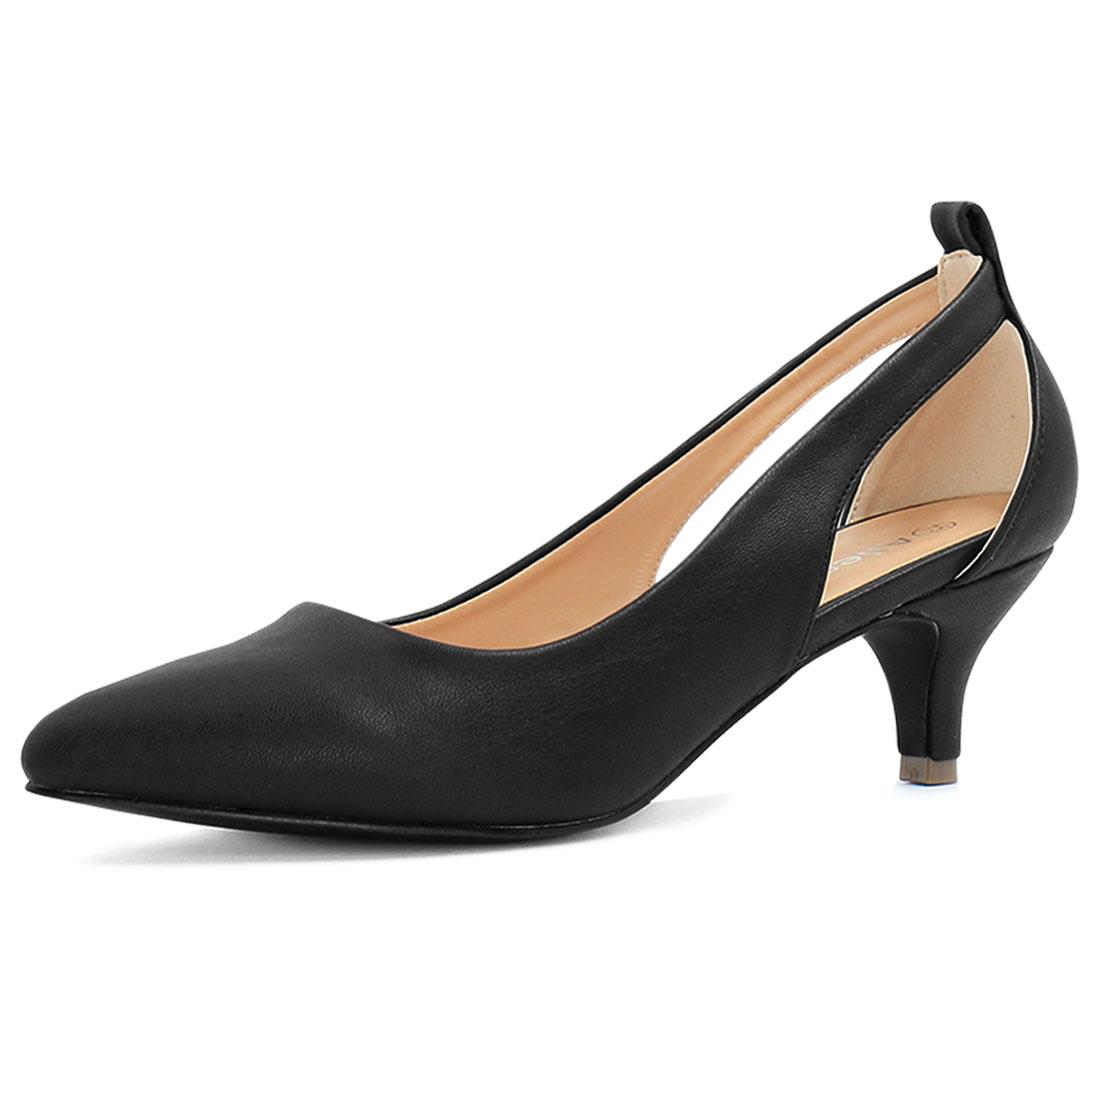 Allegra K Women's Cutout Sides Pointed Toe Kitten Heel Pumps Black US 10.5